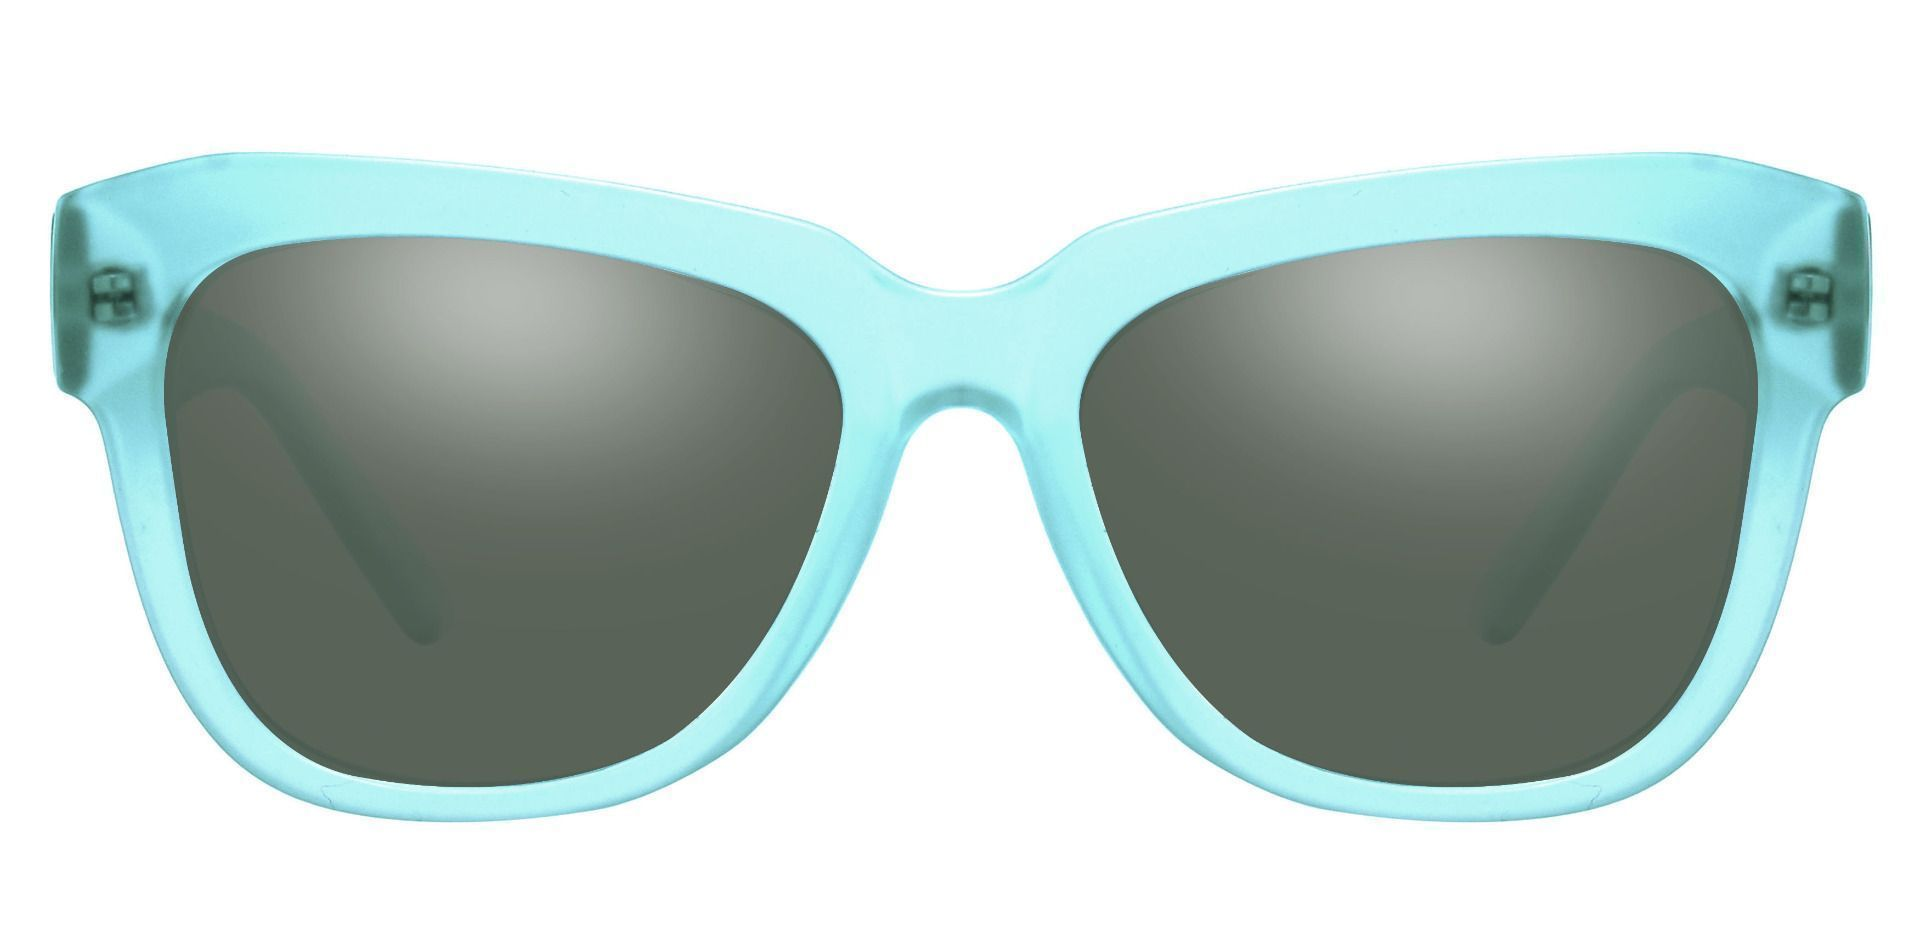 Gina Cat-Eye Reading Sunglasses - Blue Frame With Green Lenses